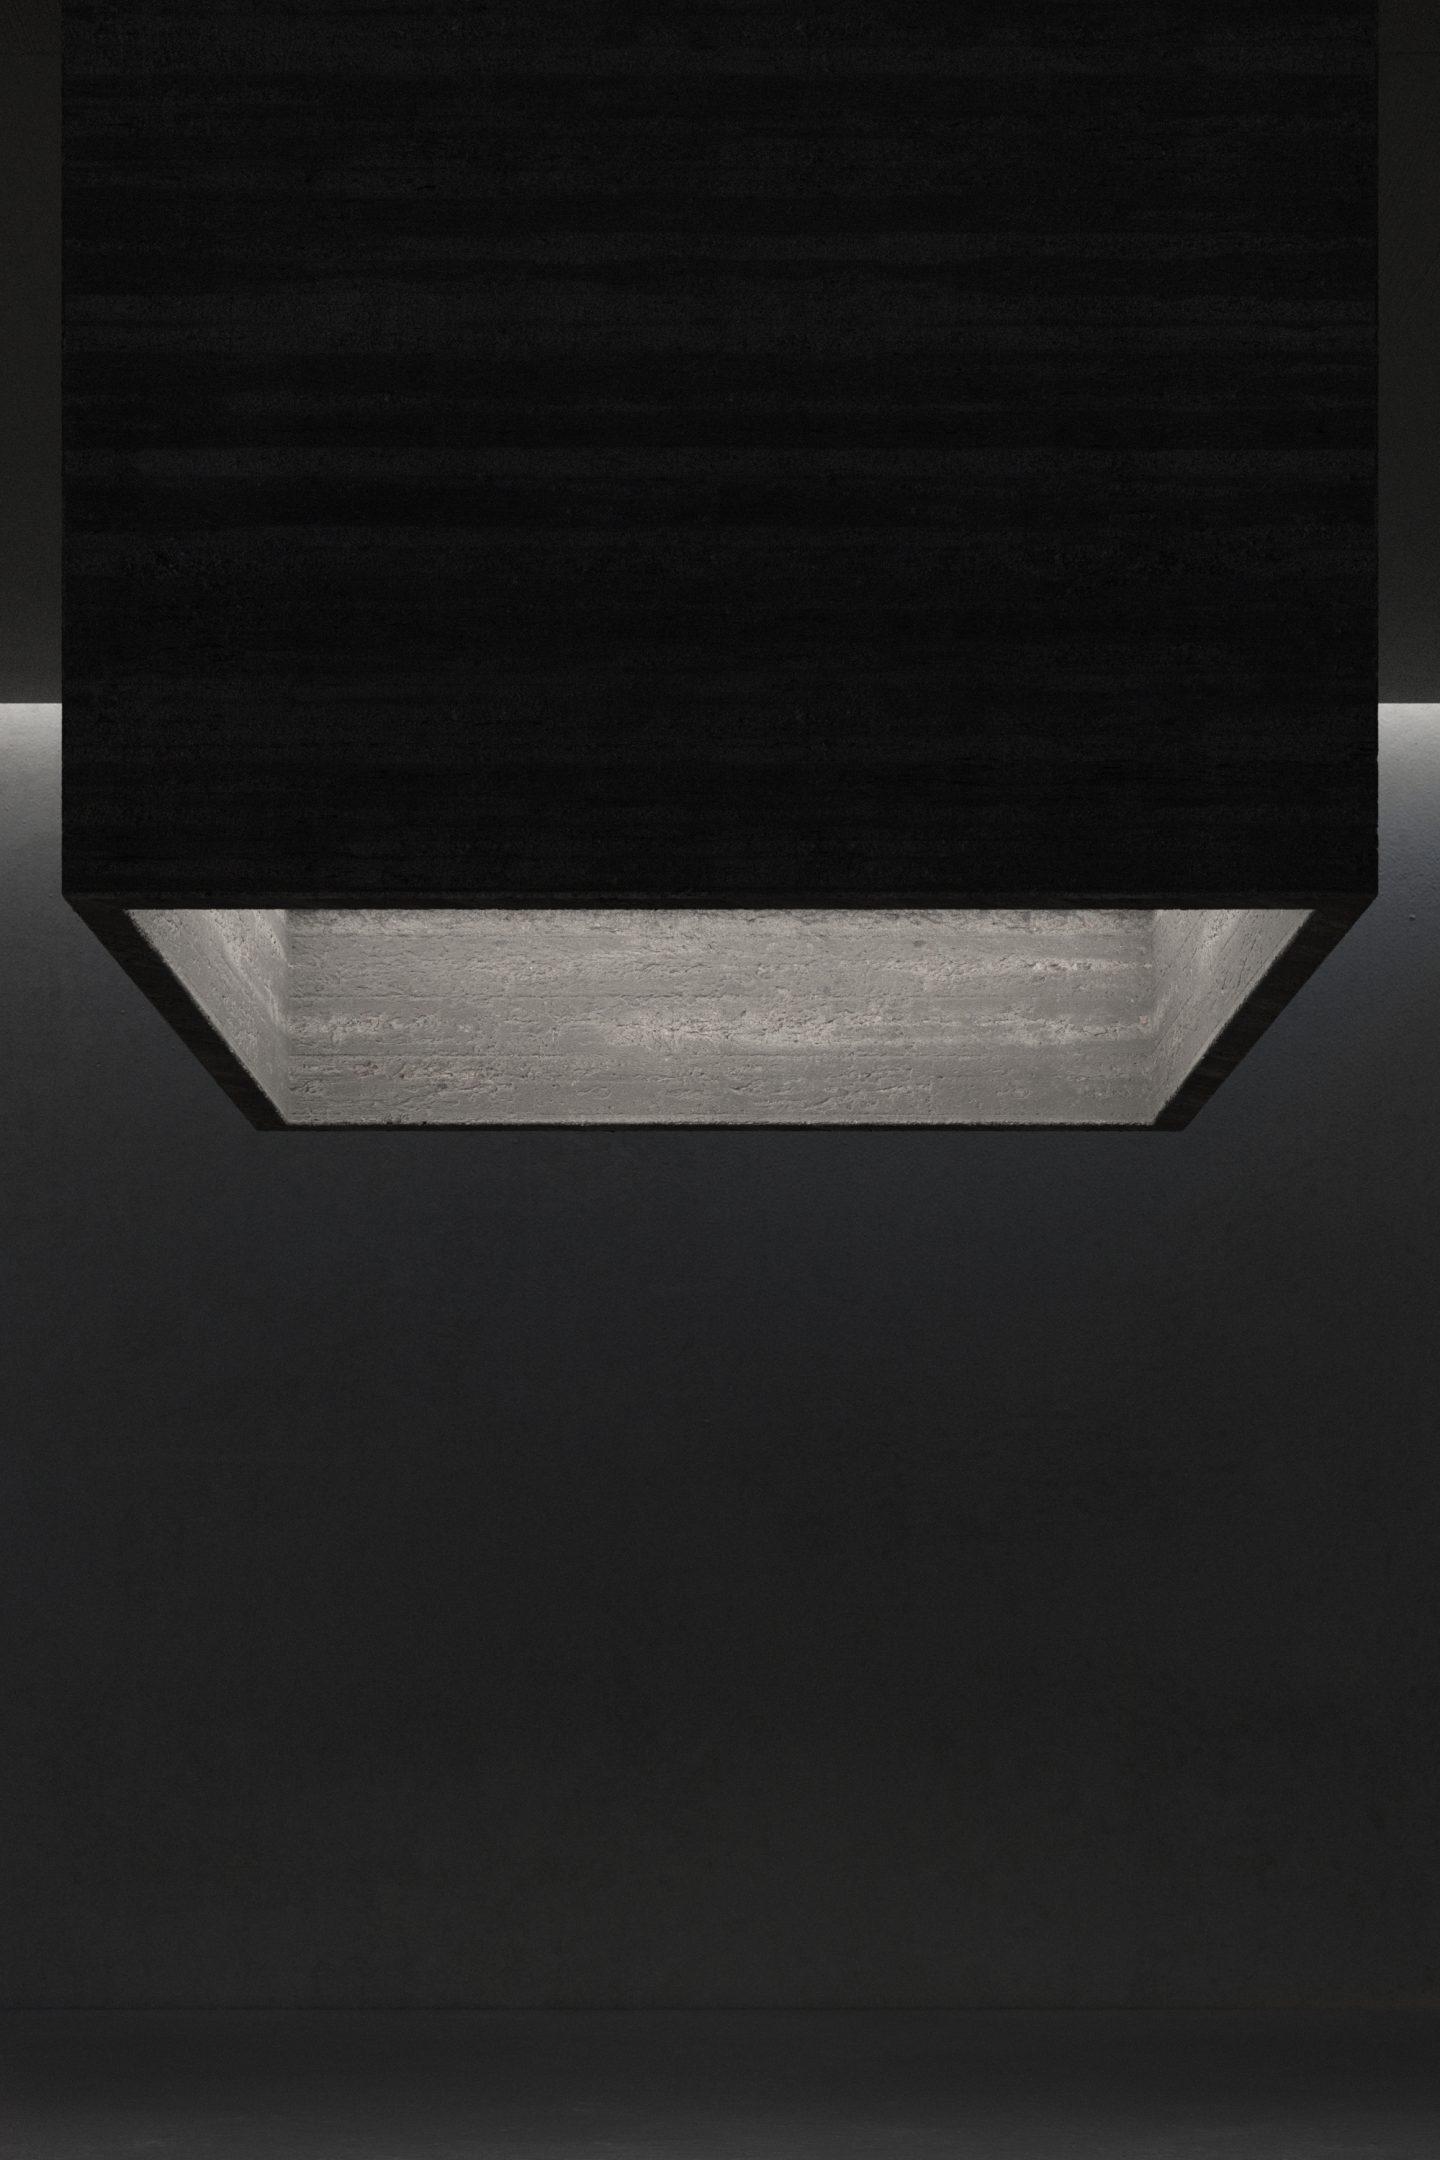 IGNANT-Art-Digital-Taupe-Chiaroscuro-2